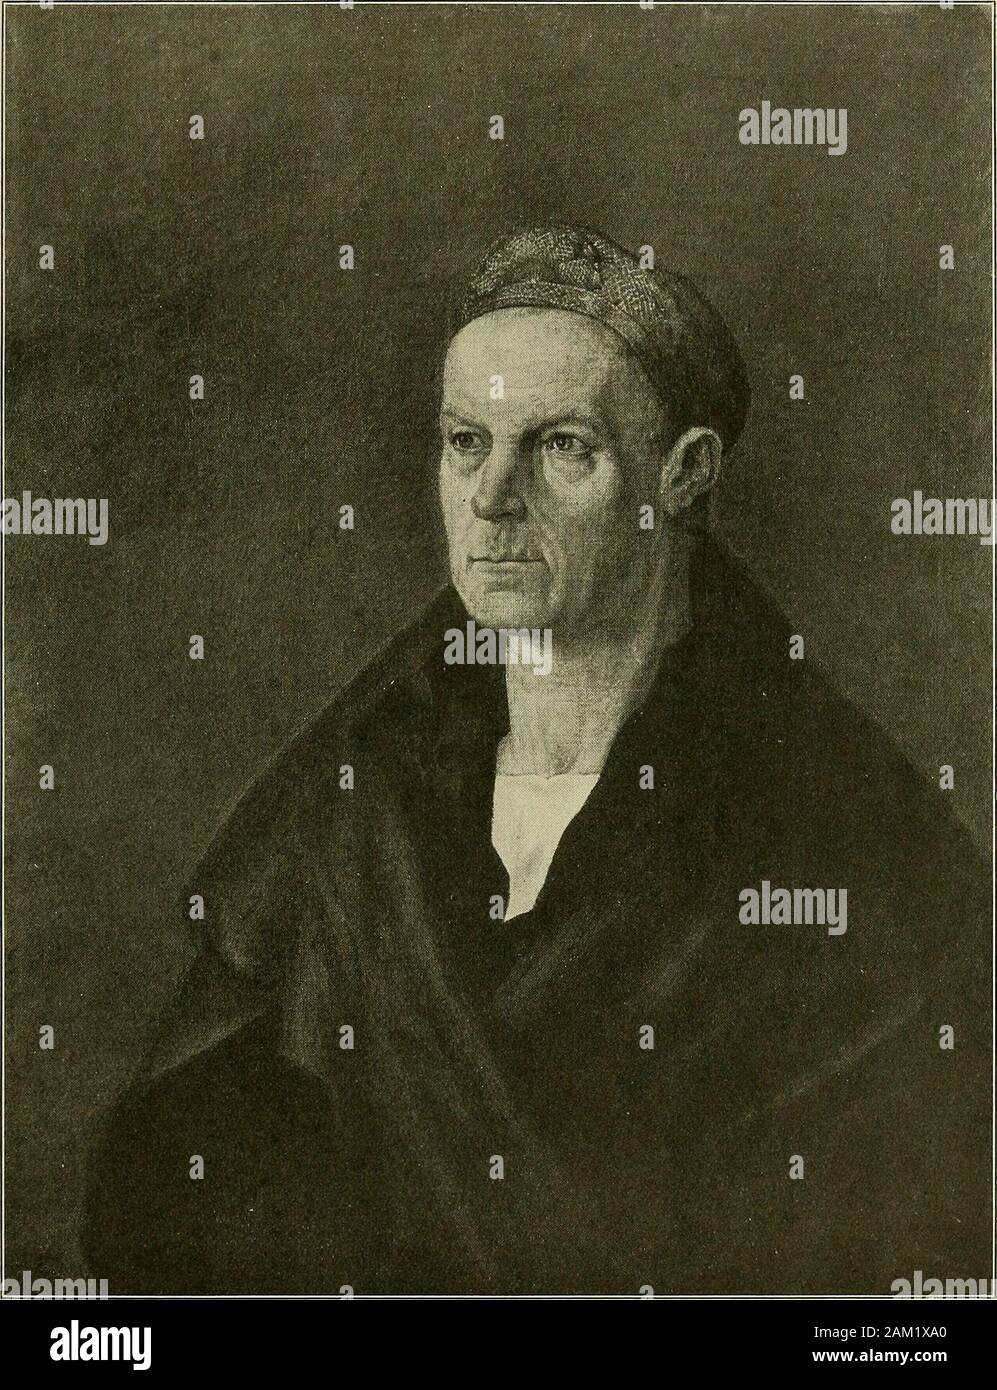 Meisterwerke der Älteren Pinakothek in München ... . Lindenholz 67X49cm Albrecht Dürer. Selbstbildnis im Pelzrock. 42. Leinwand 69X53cm Albrecht Dürer. Bildnis Jakob Fuggers des Reichen 43 Stock Photo